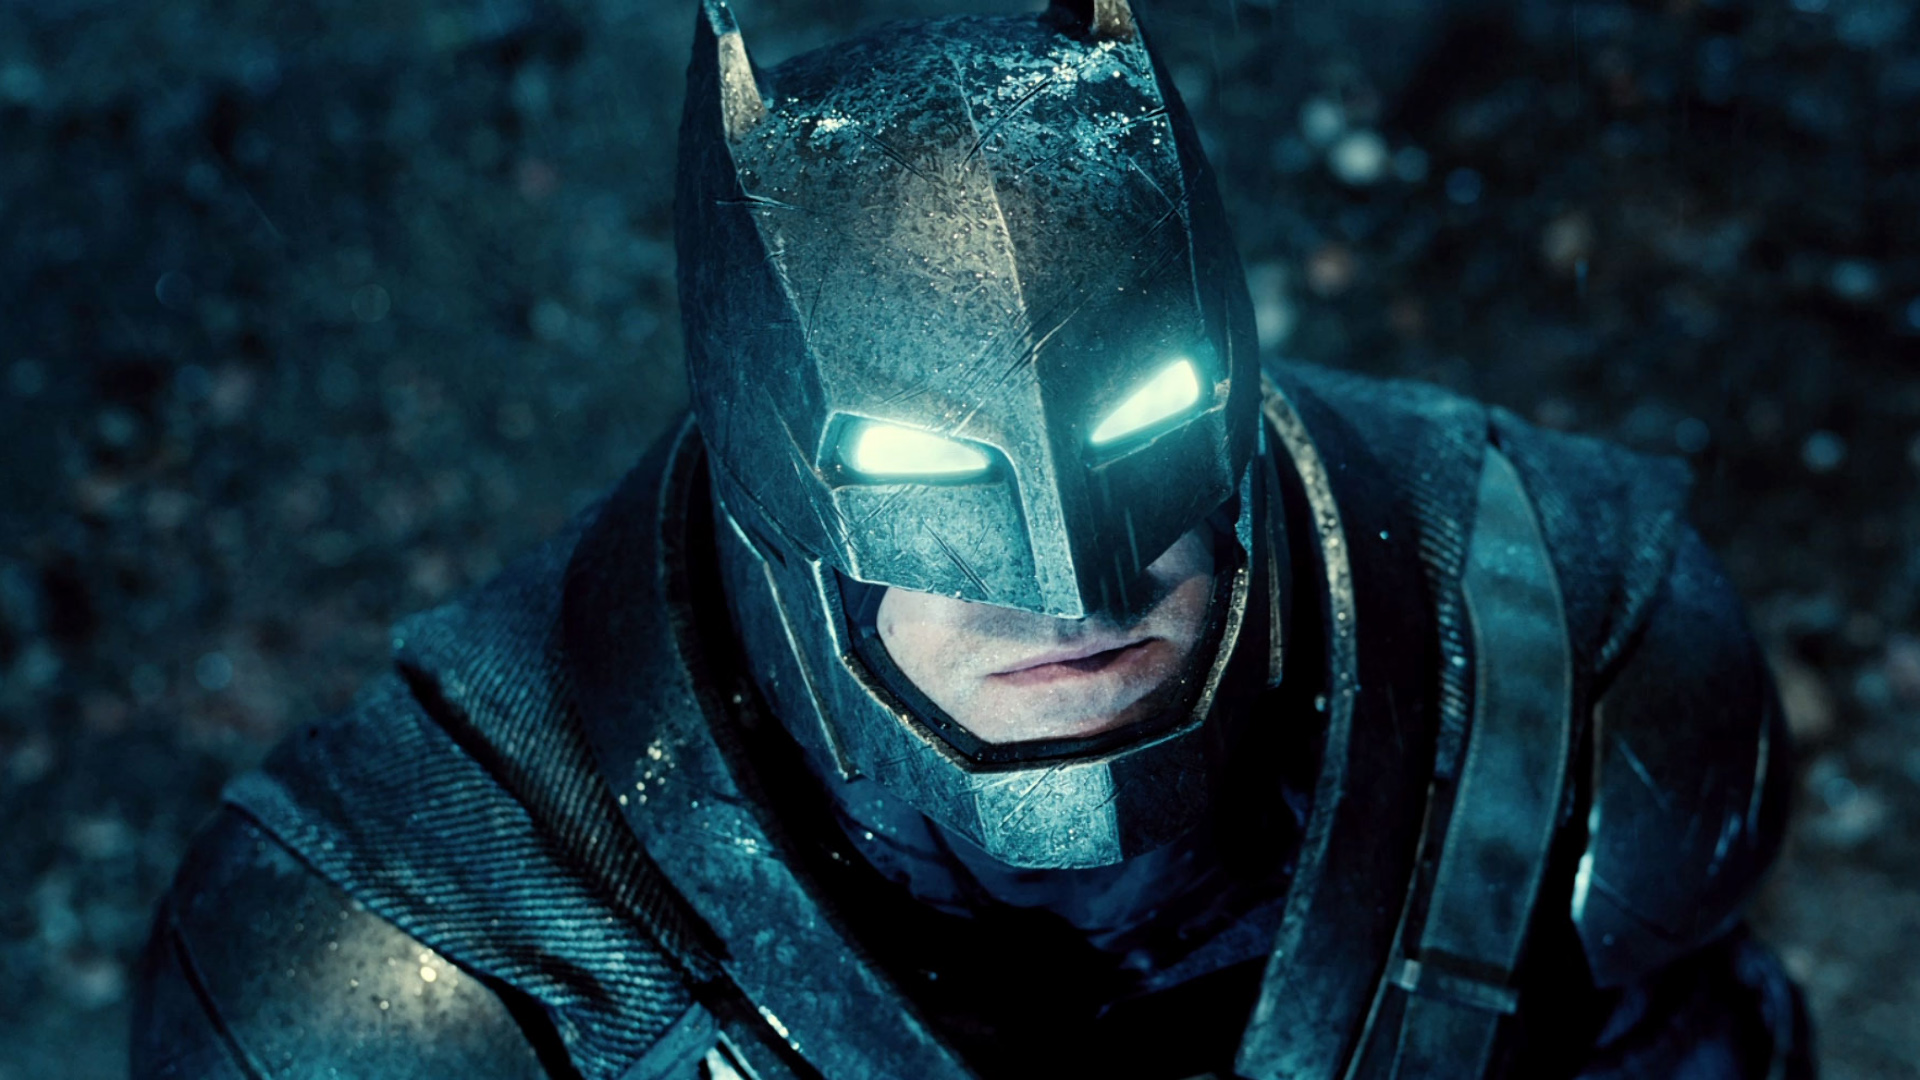 Batman Metal Armour in Batman v Superman Dawn of Justice Wallpaper by 1920x1080